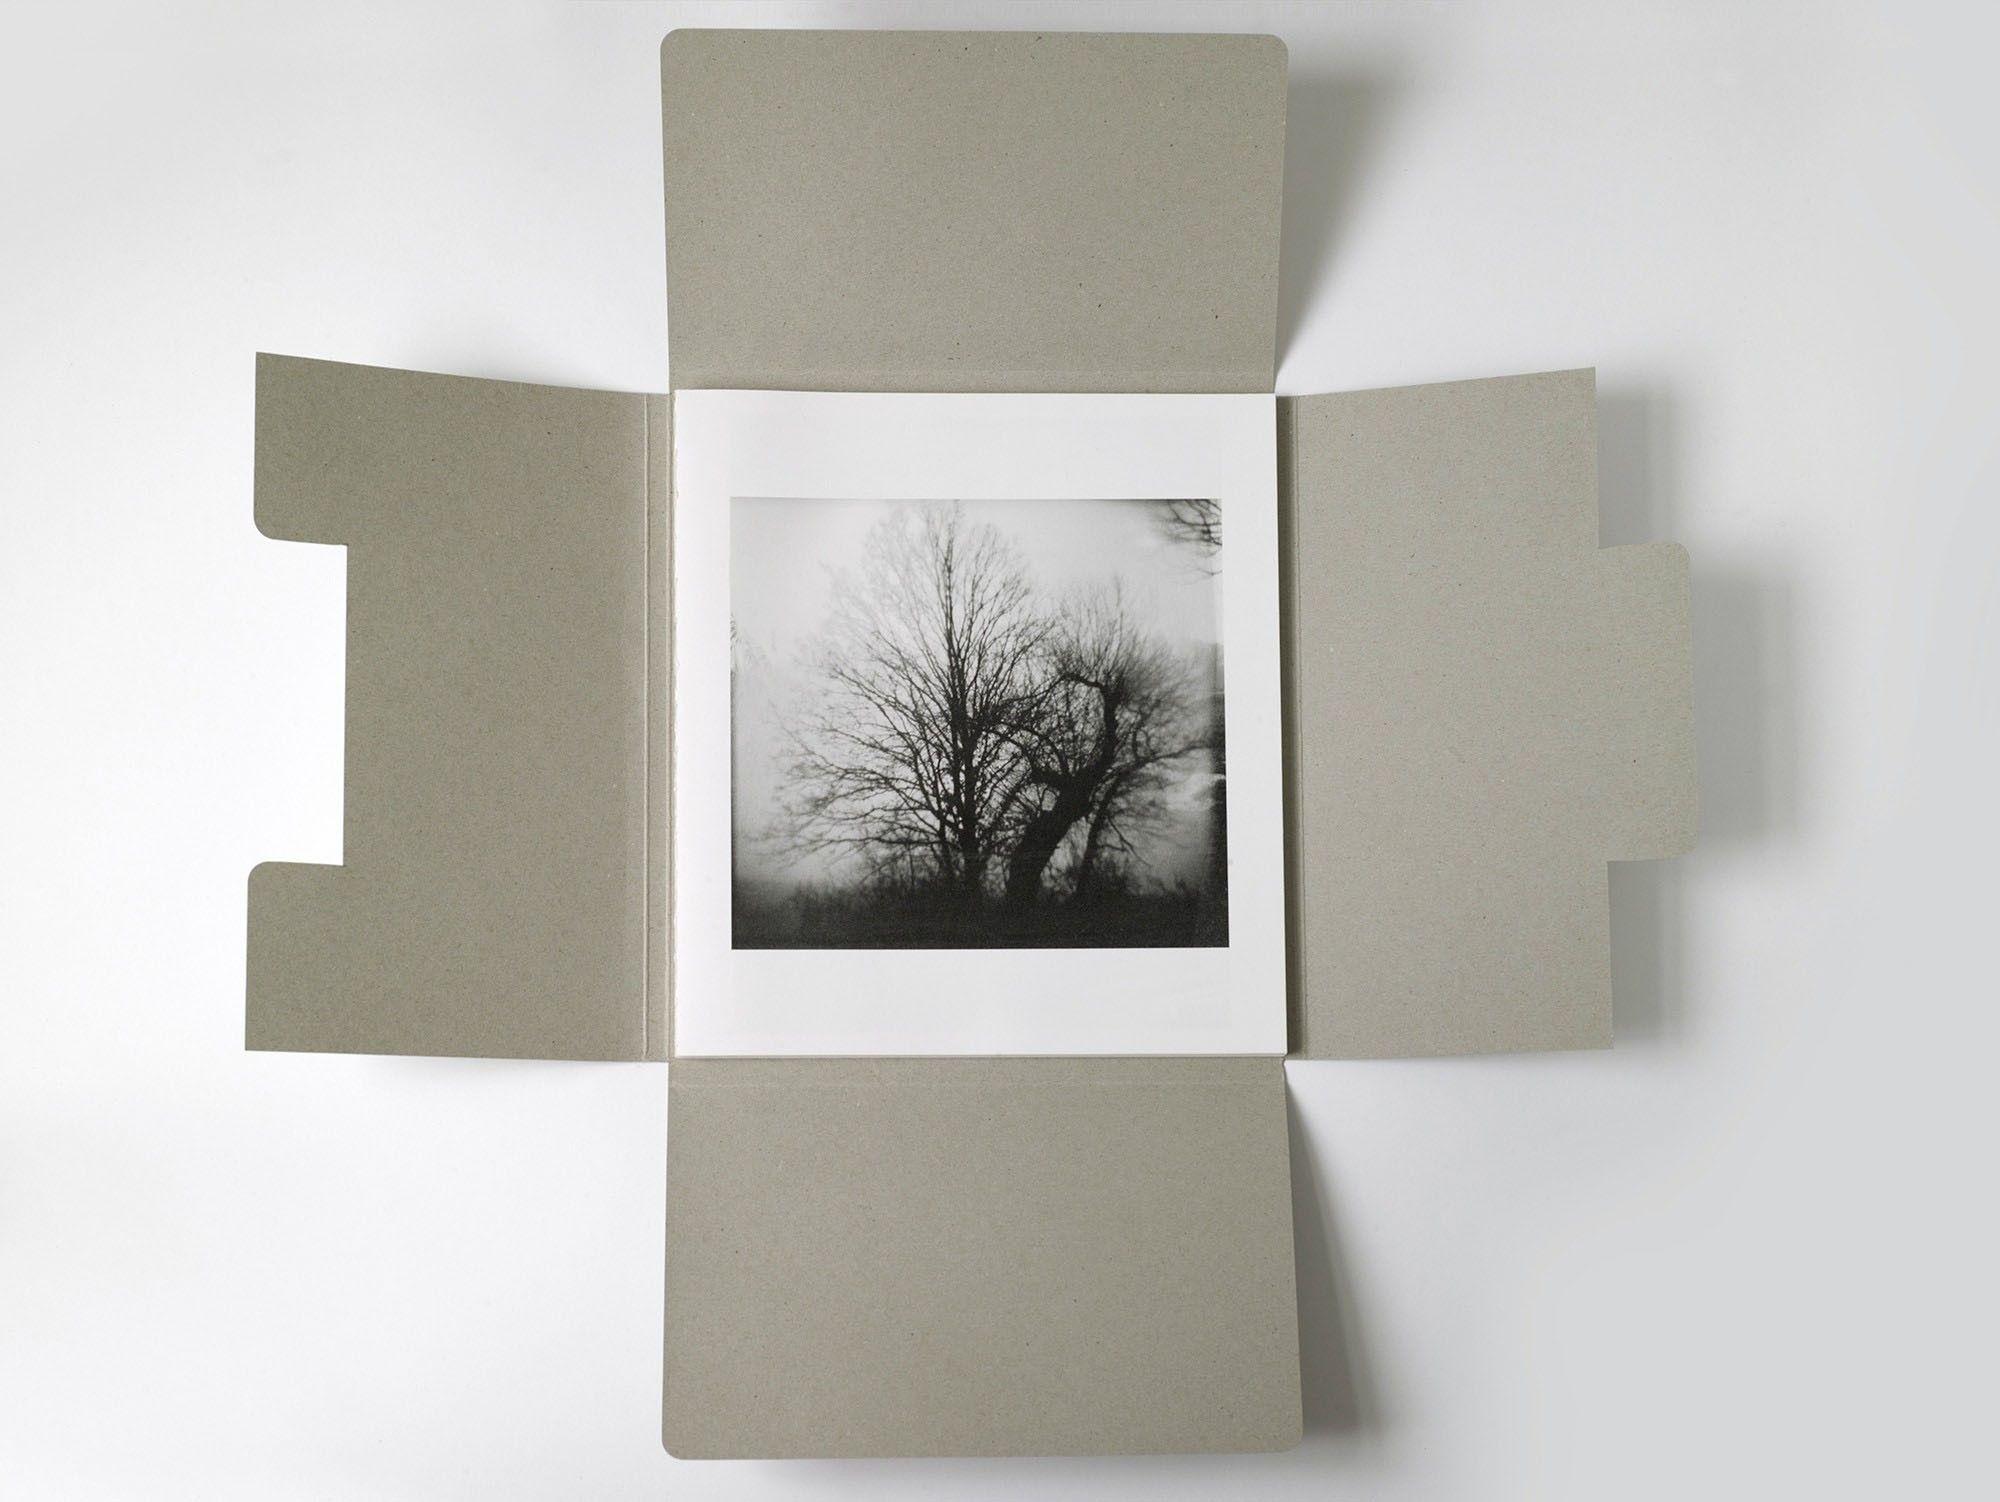 b.frank books - Ester Vonplon – cudesch da visitas